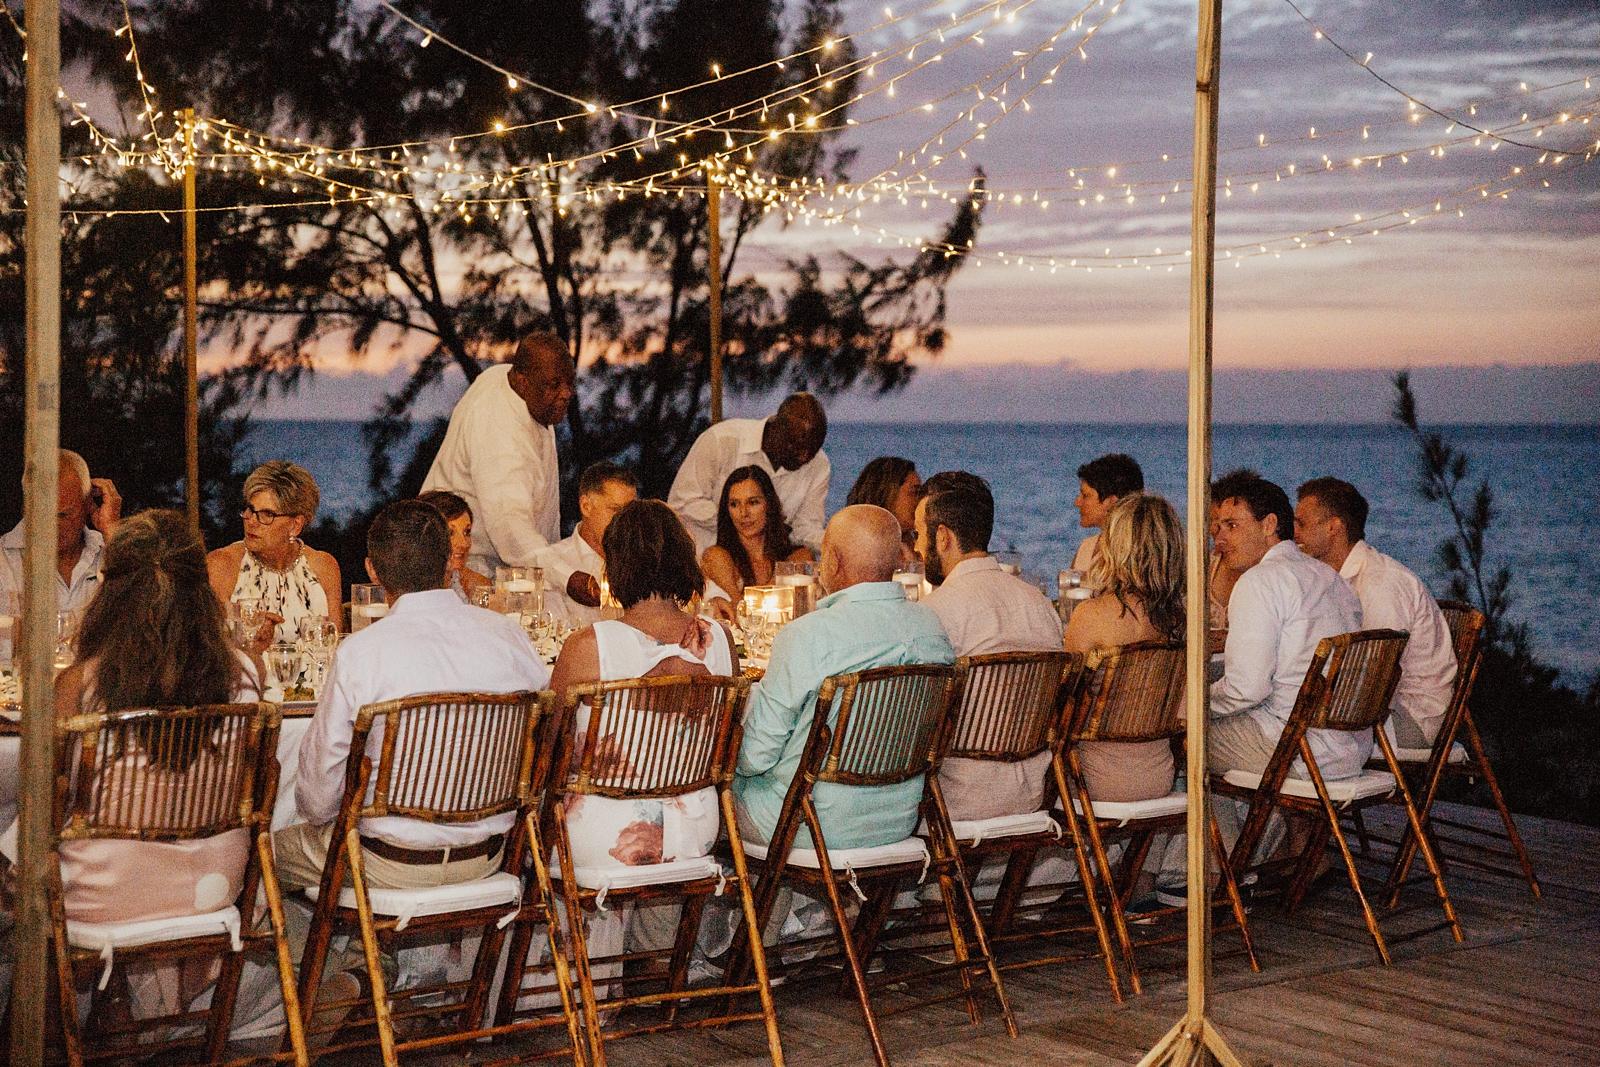 Jenni & Andrew Intimate Beach Destination Wedding in Little Exuma, Bahamas_0535.jpg